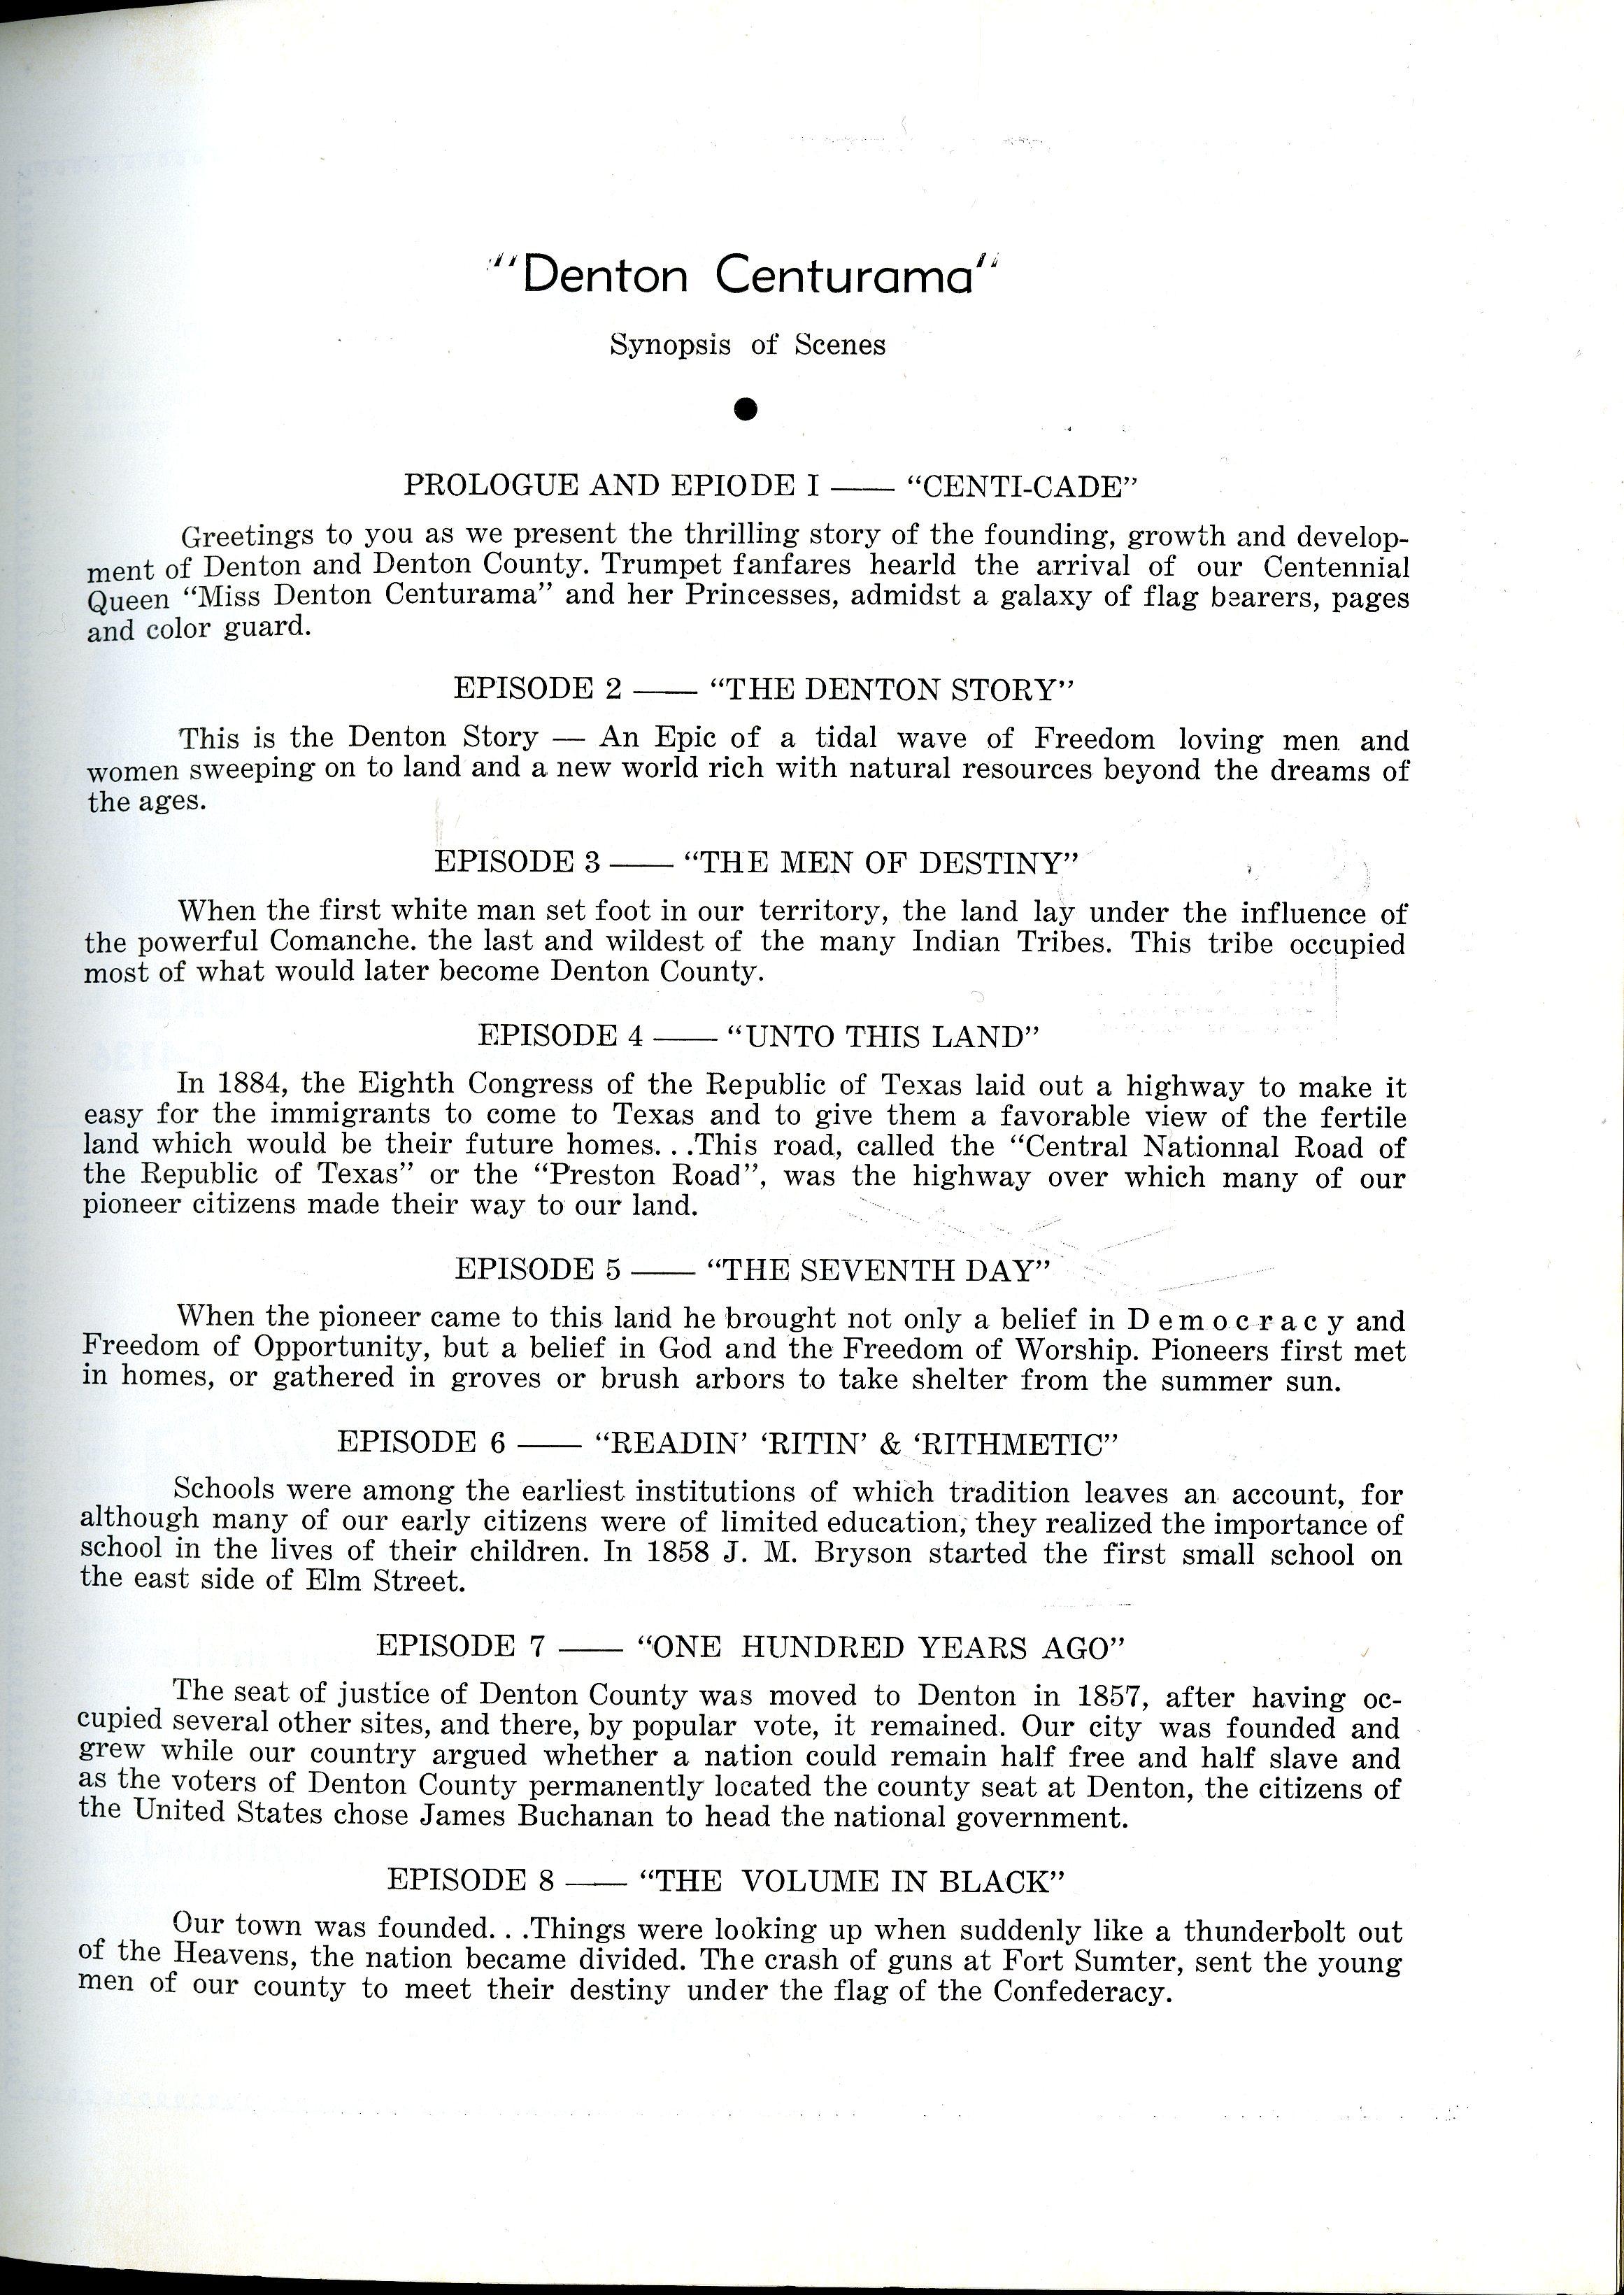 Denton Centurama Program First Page